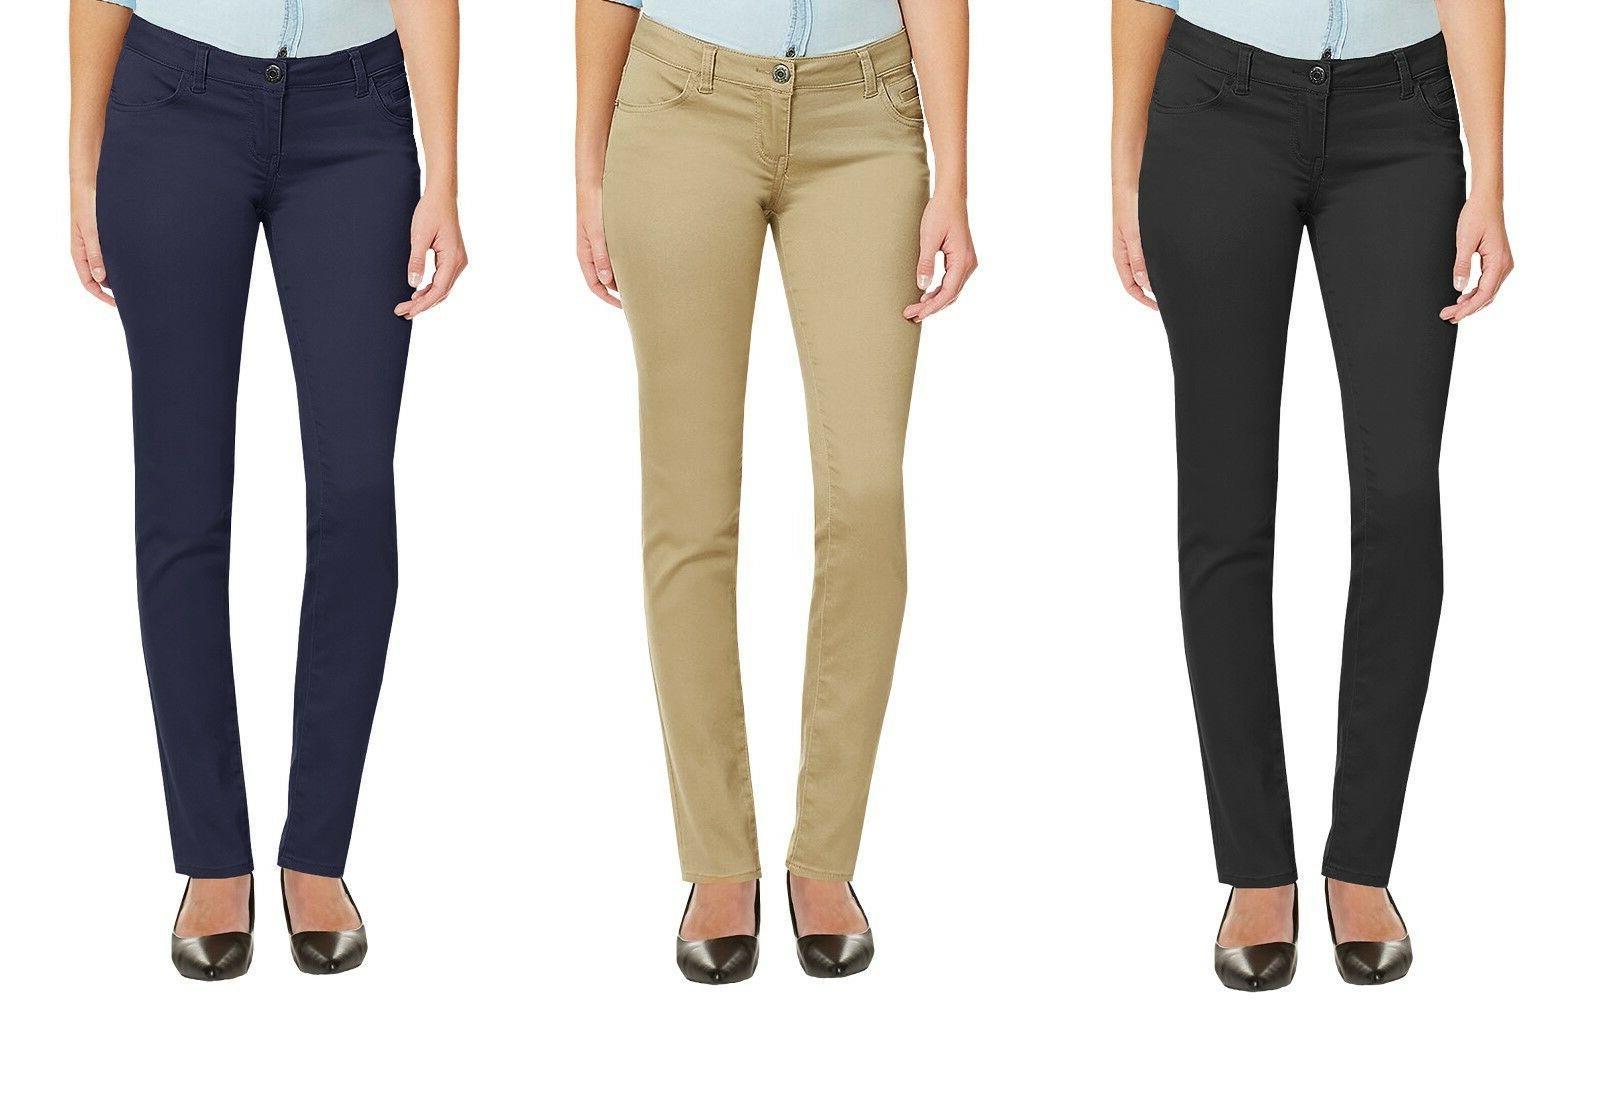 Girls Skinny Pants Stretch Chino Work School Uniform Cotton